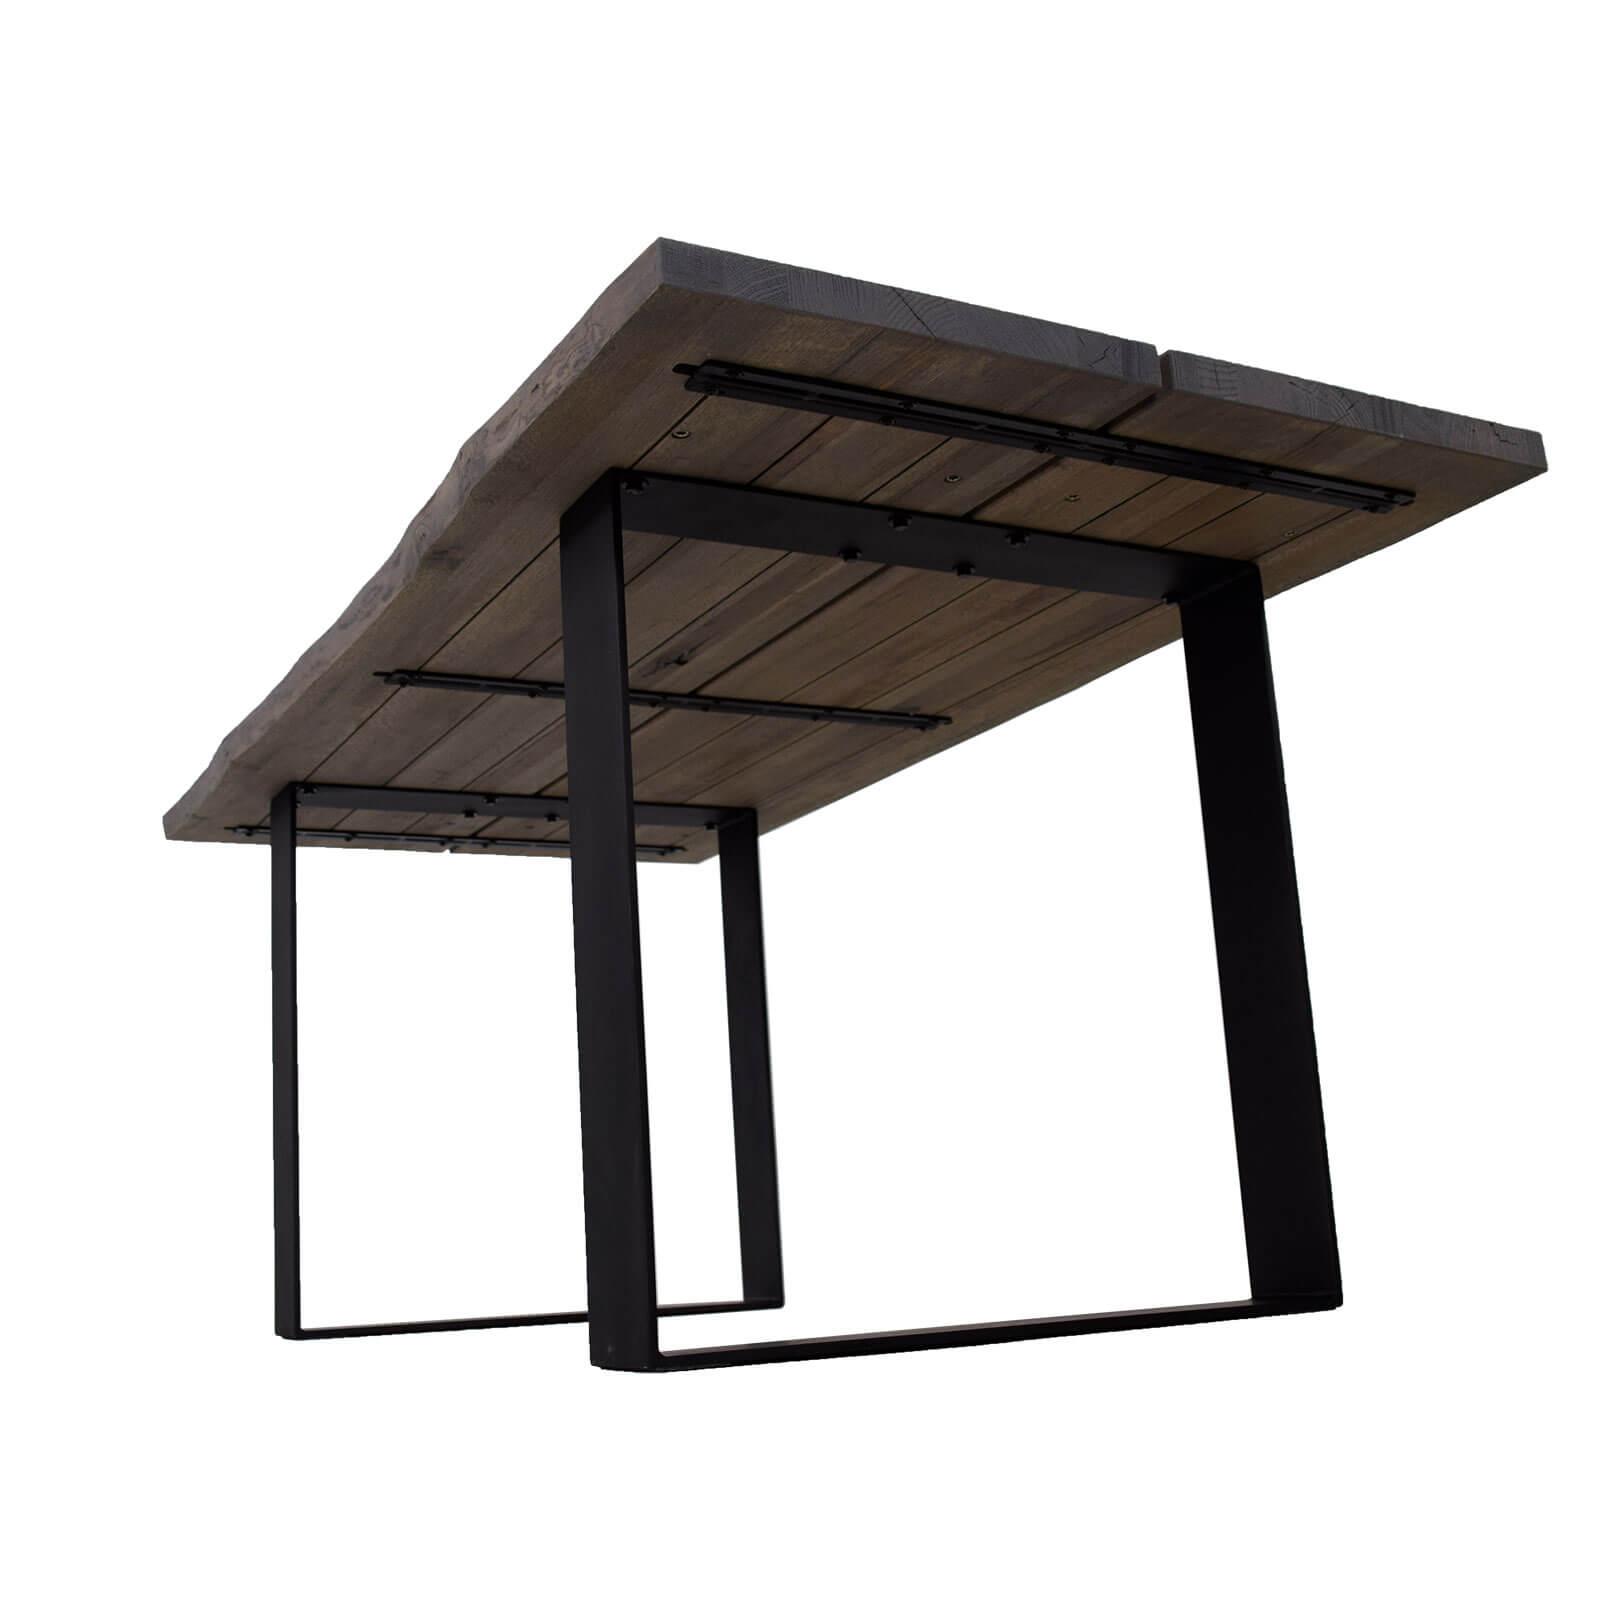 esstisch edge eiche massiv grau 180 x 90 cm. Black Bedroom Furniture Sets. Home Design Ideas